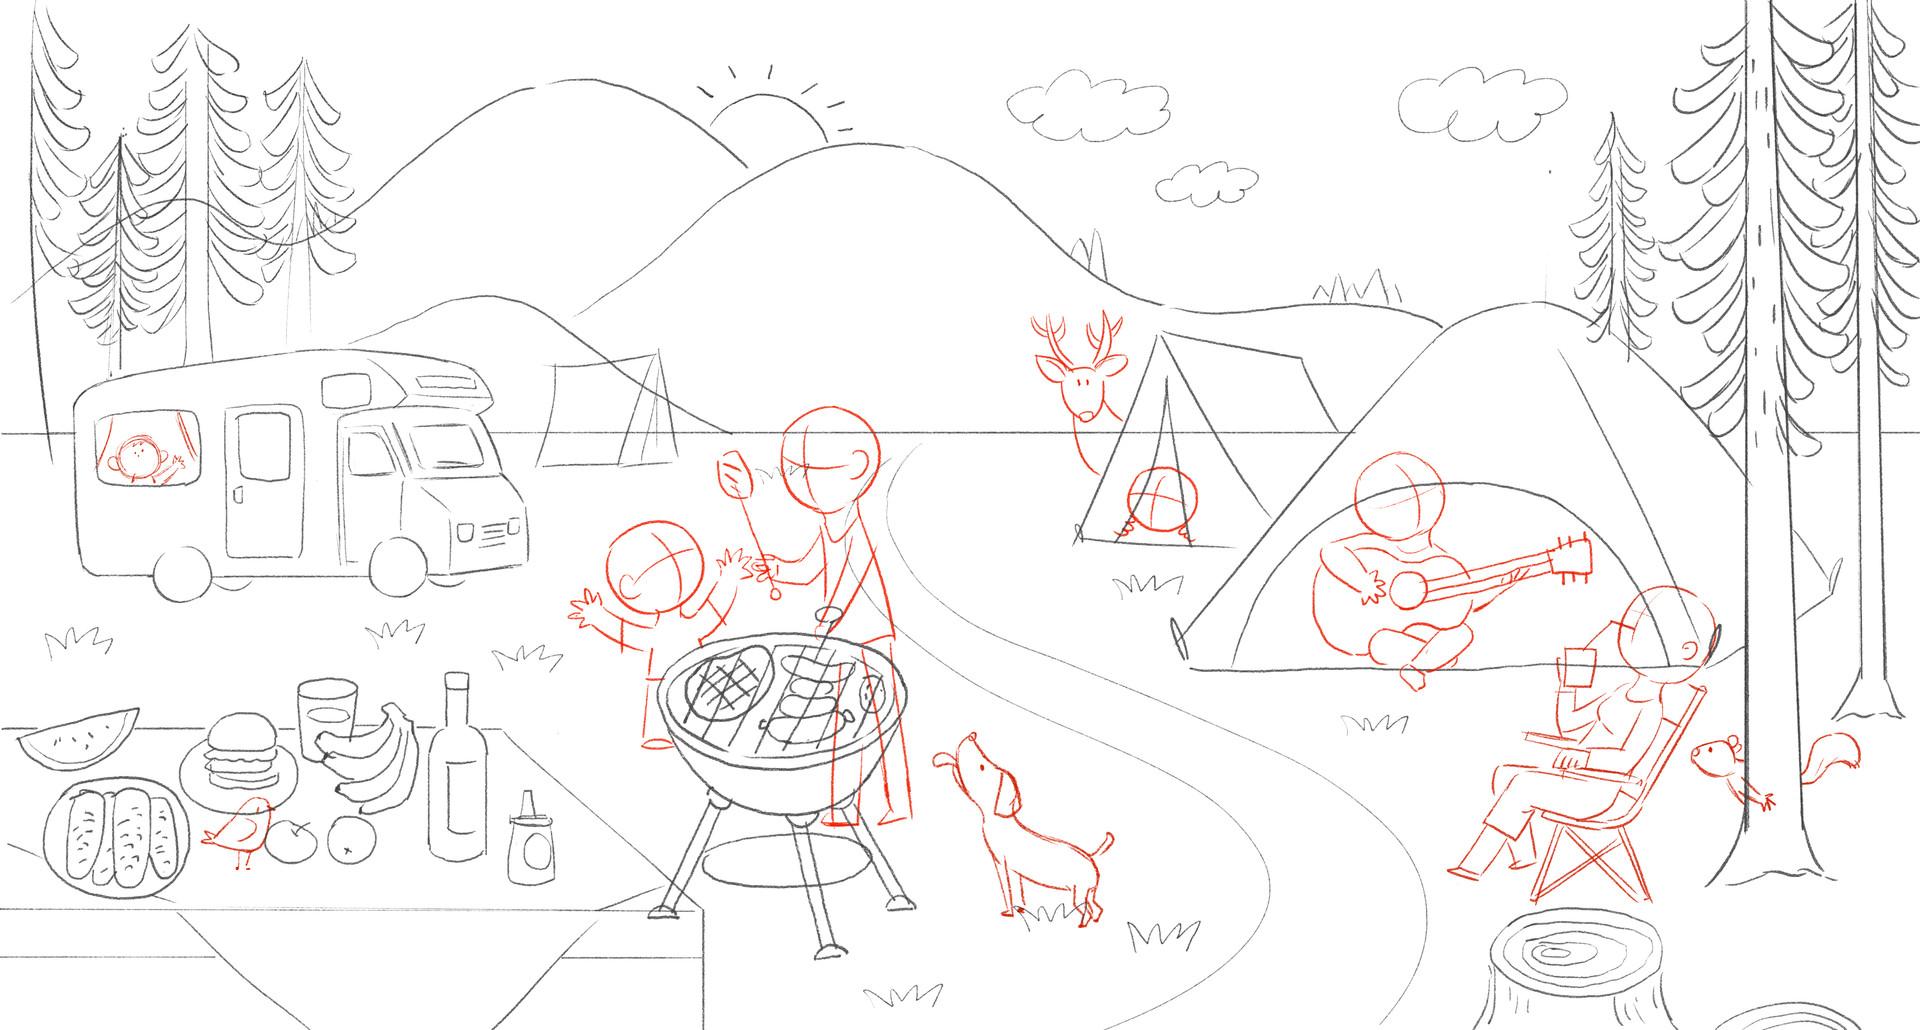 P44-45 Camping Theme.jpg